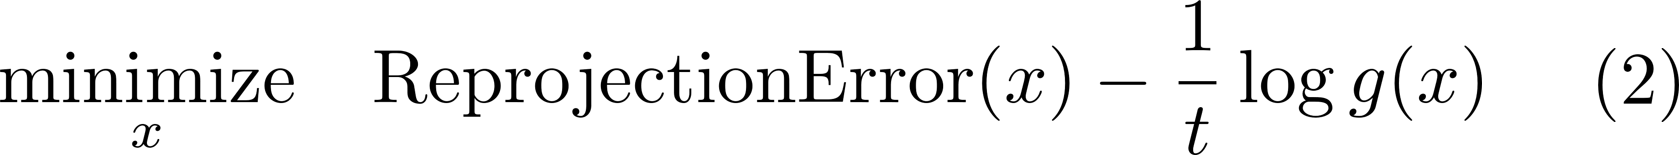 adversarial_constraint_eq2